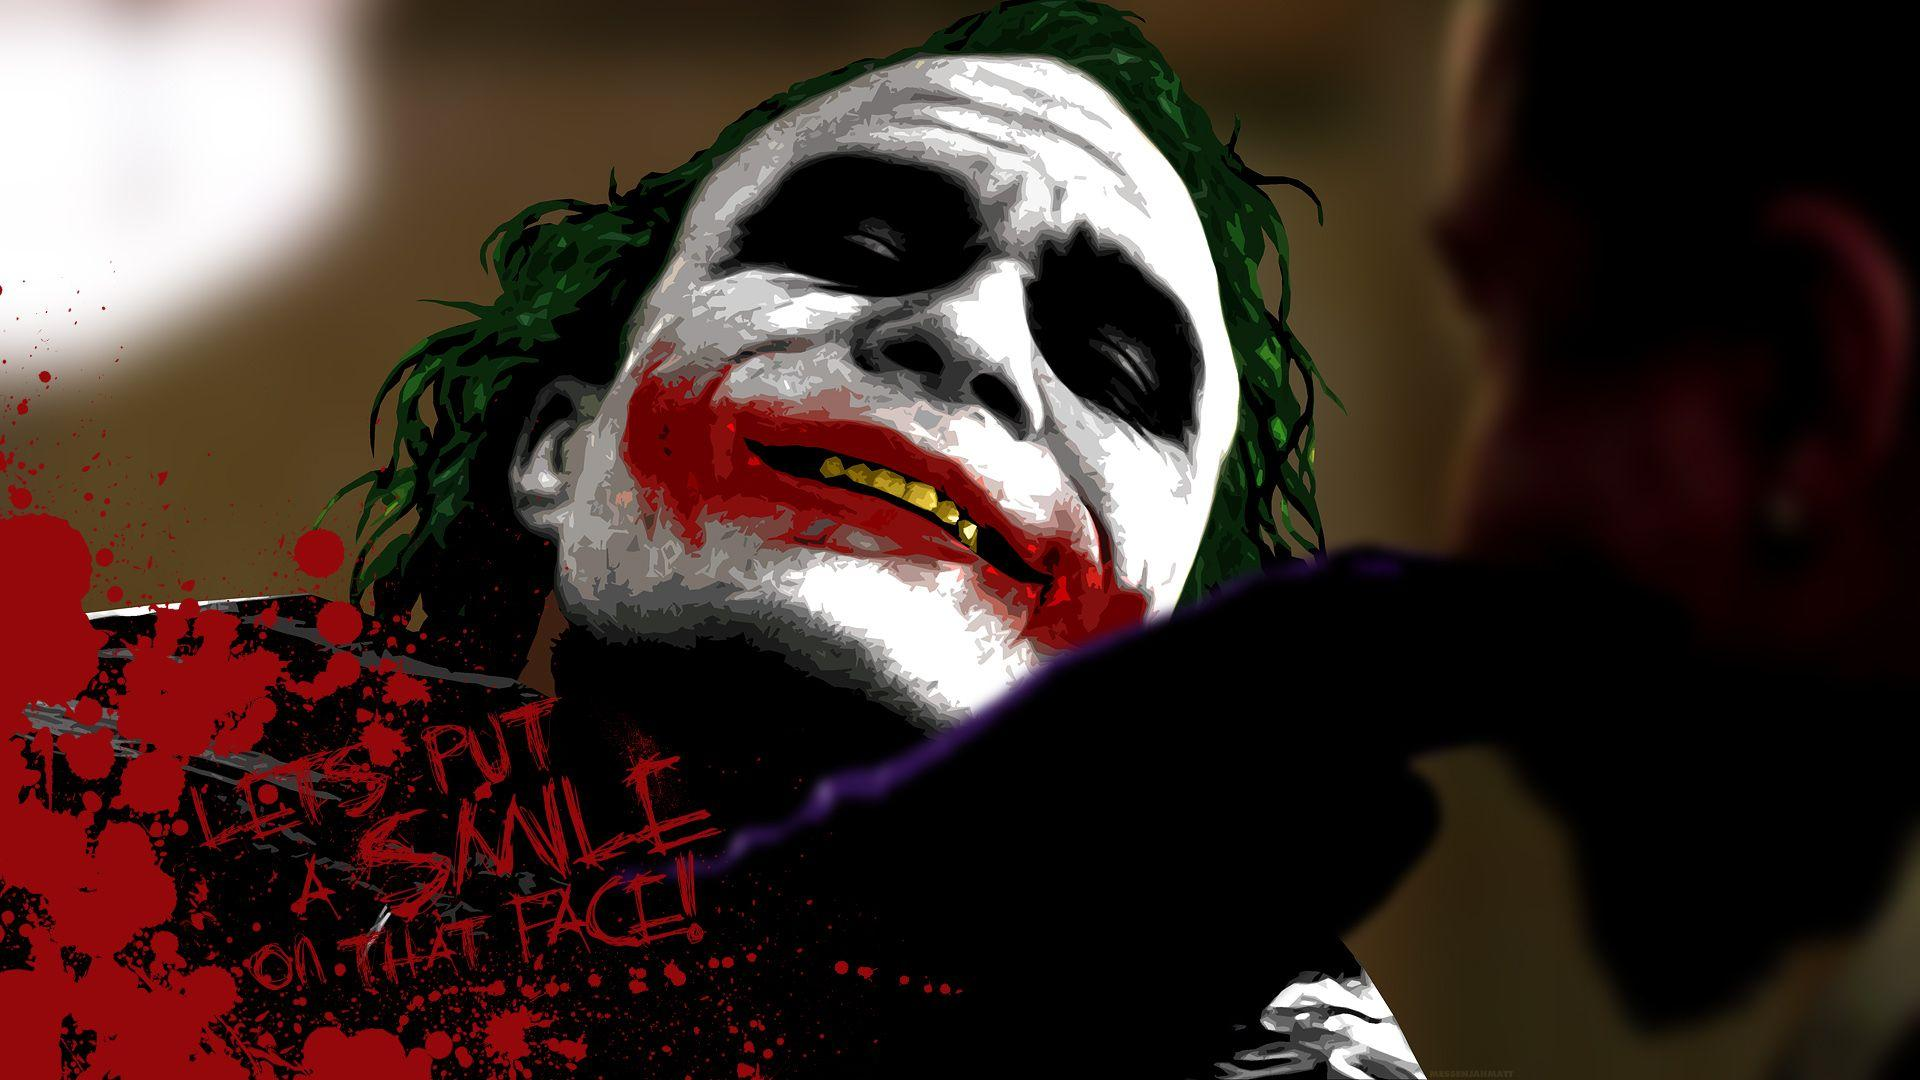 Batman Joker Hd Wallpapers Wallpaper Cave